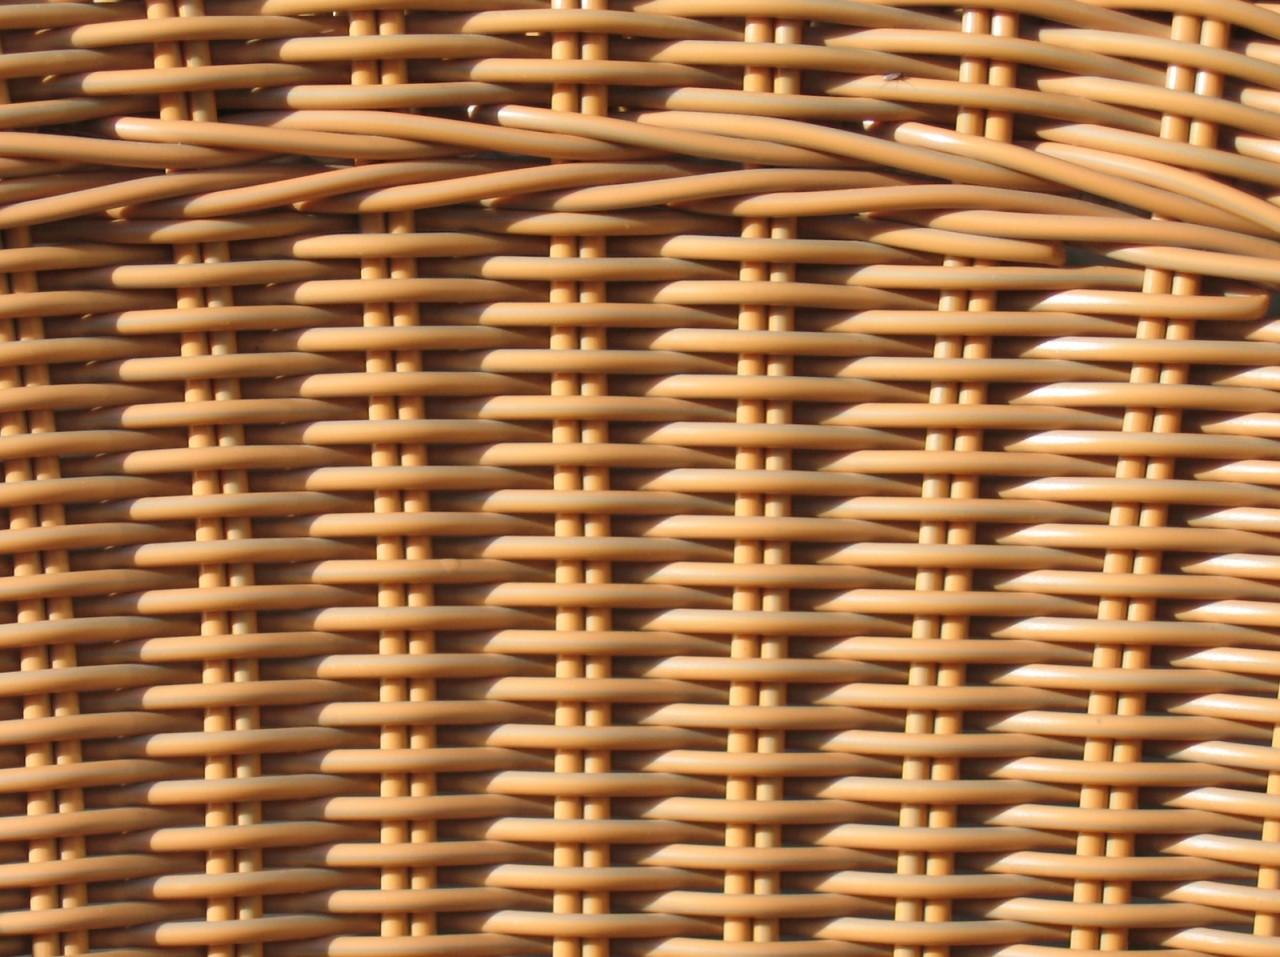 rattan-texture-2-1158193-1599x1196